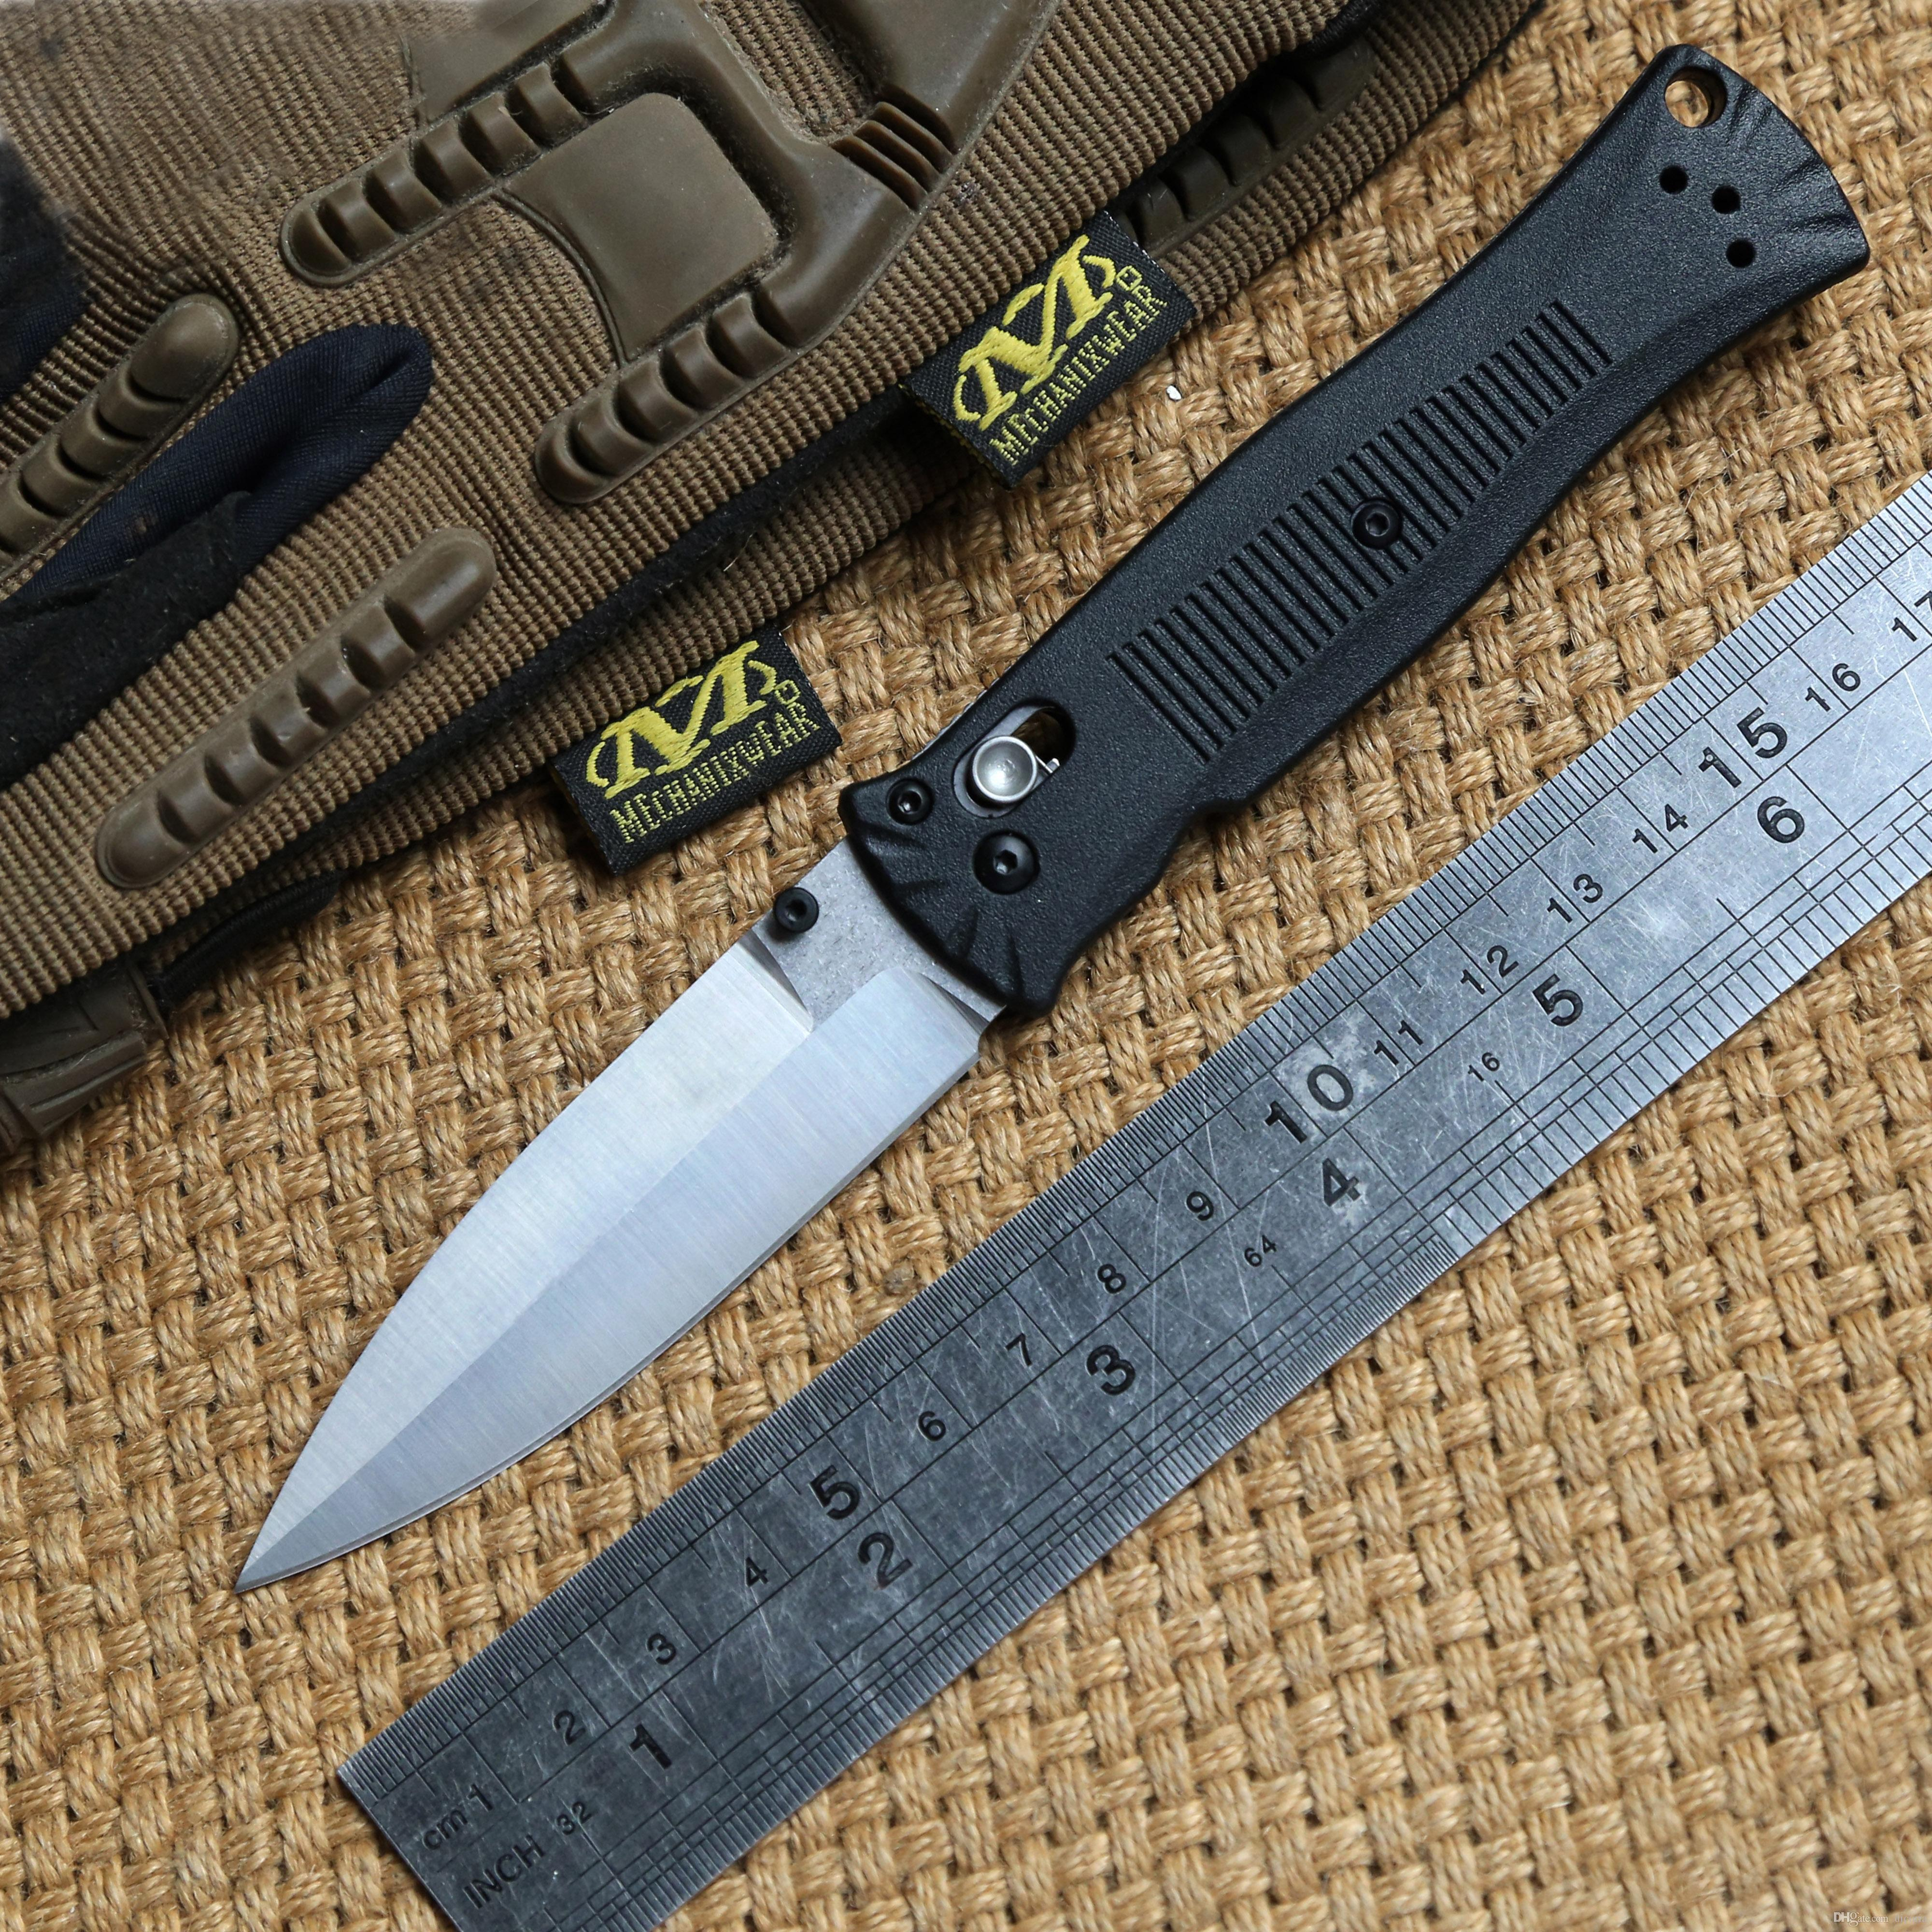 Dicoria 154cm folding knife outdoor camping knife EDC defense tools knife